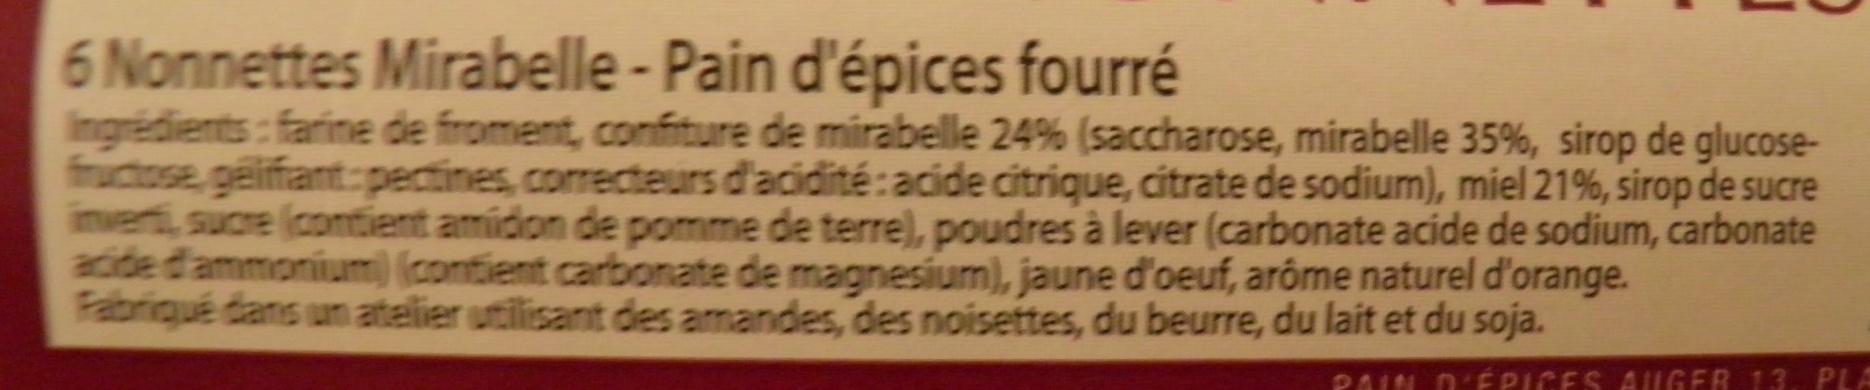 Nonnettes Mirabelle Auger - Ingredients - fr